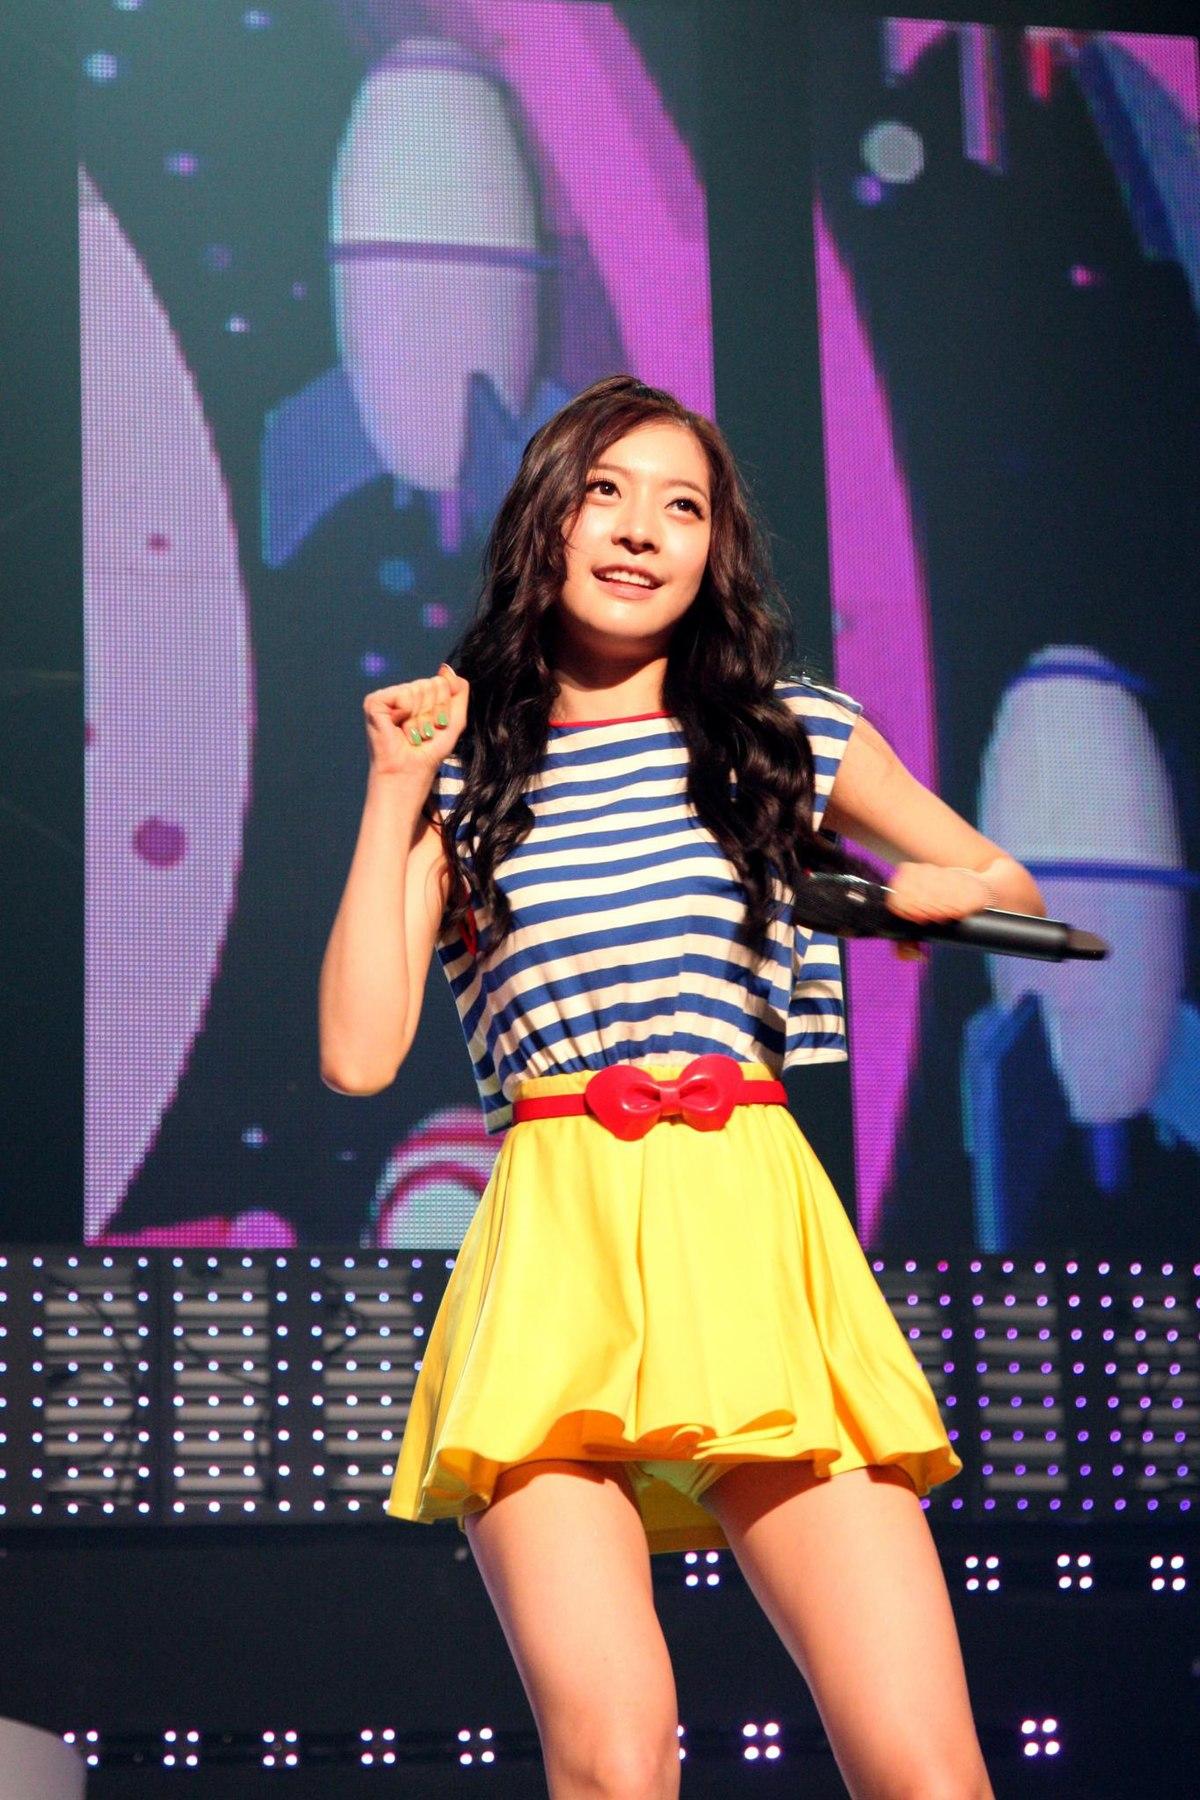 Hot korean girl at httpmyadultvideoslivewatch - 3 6